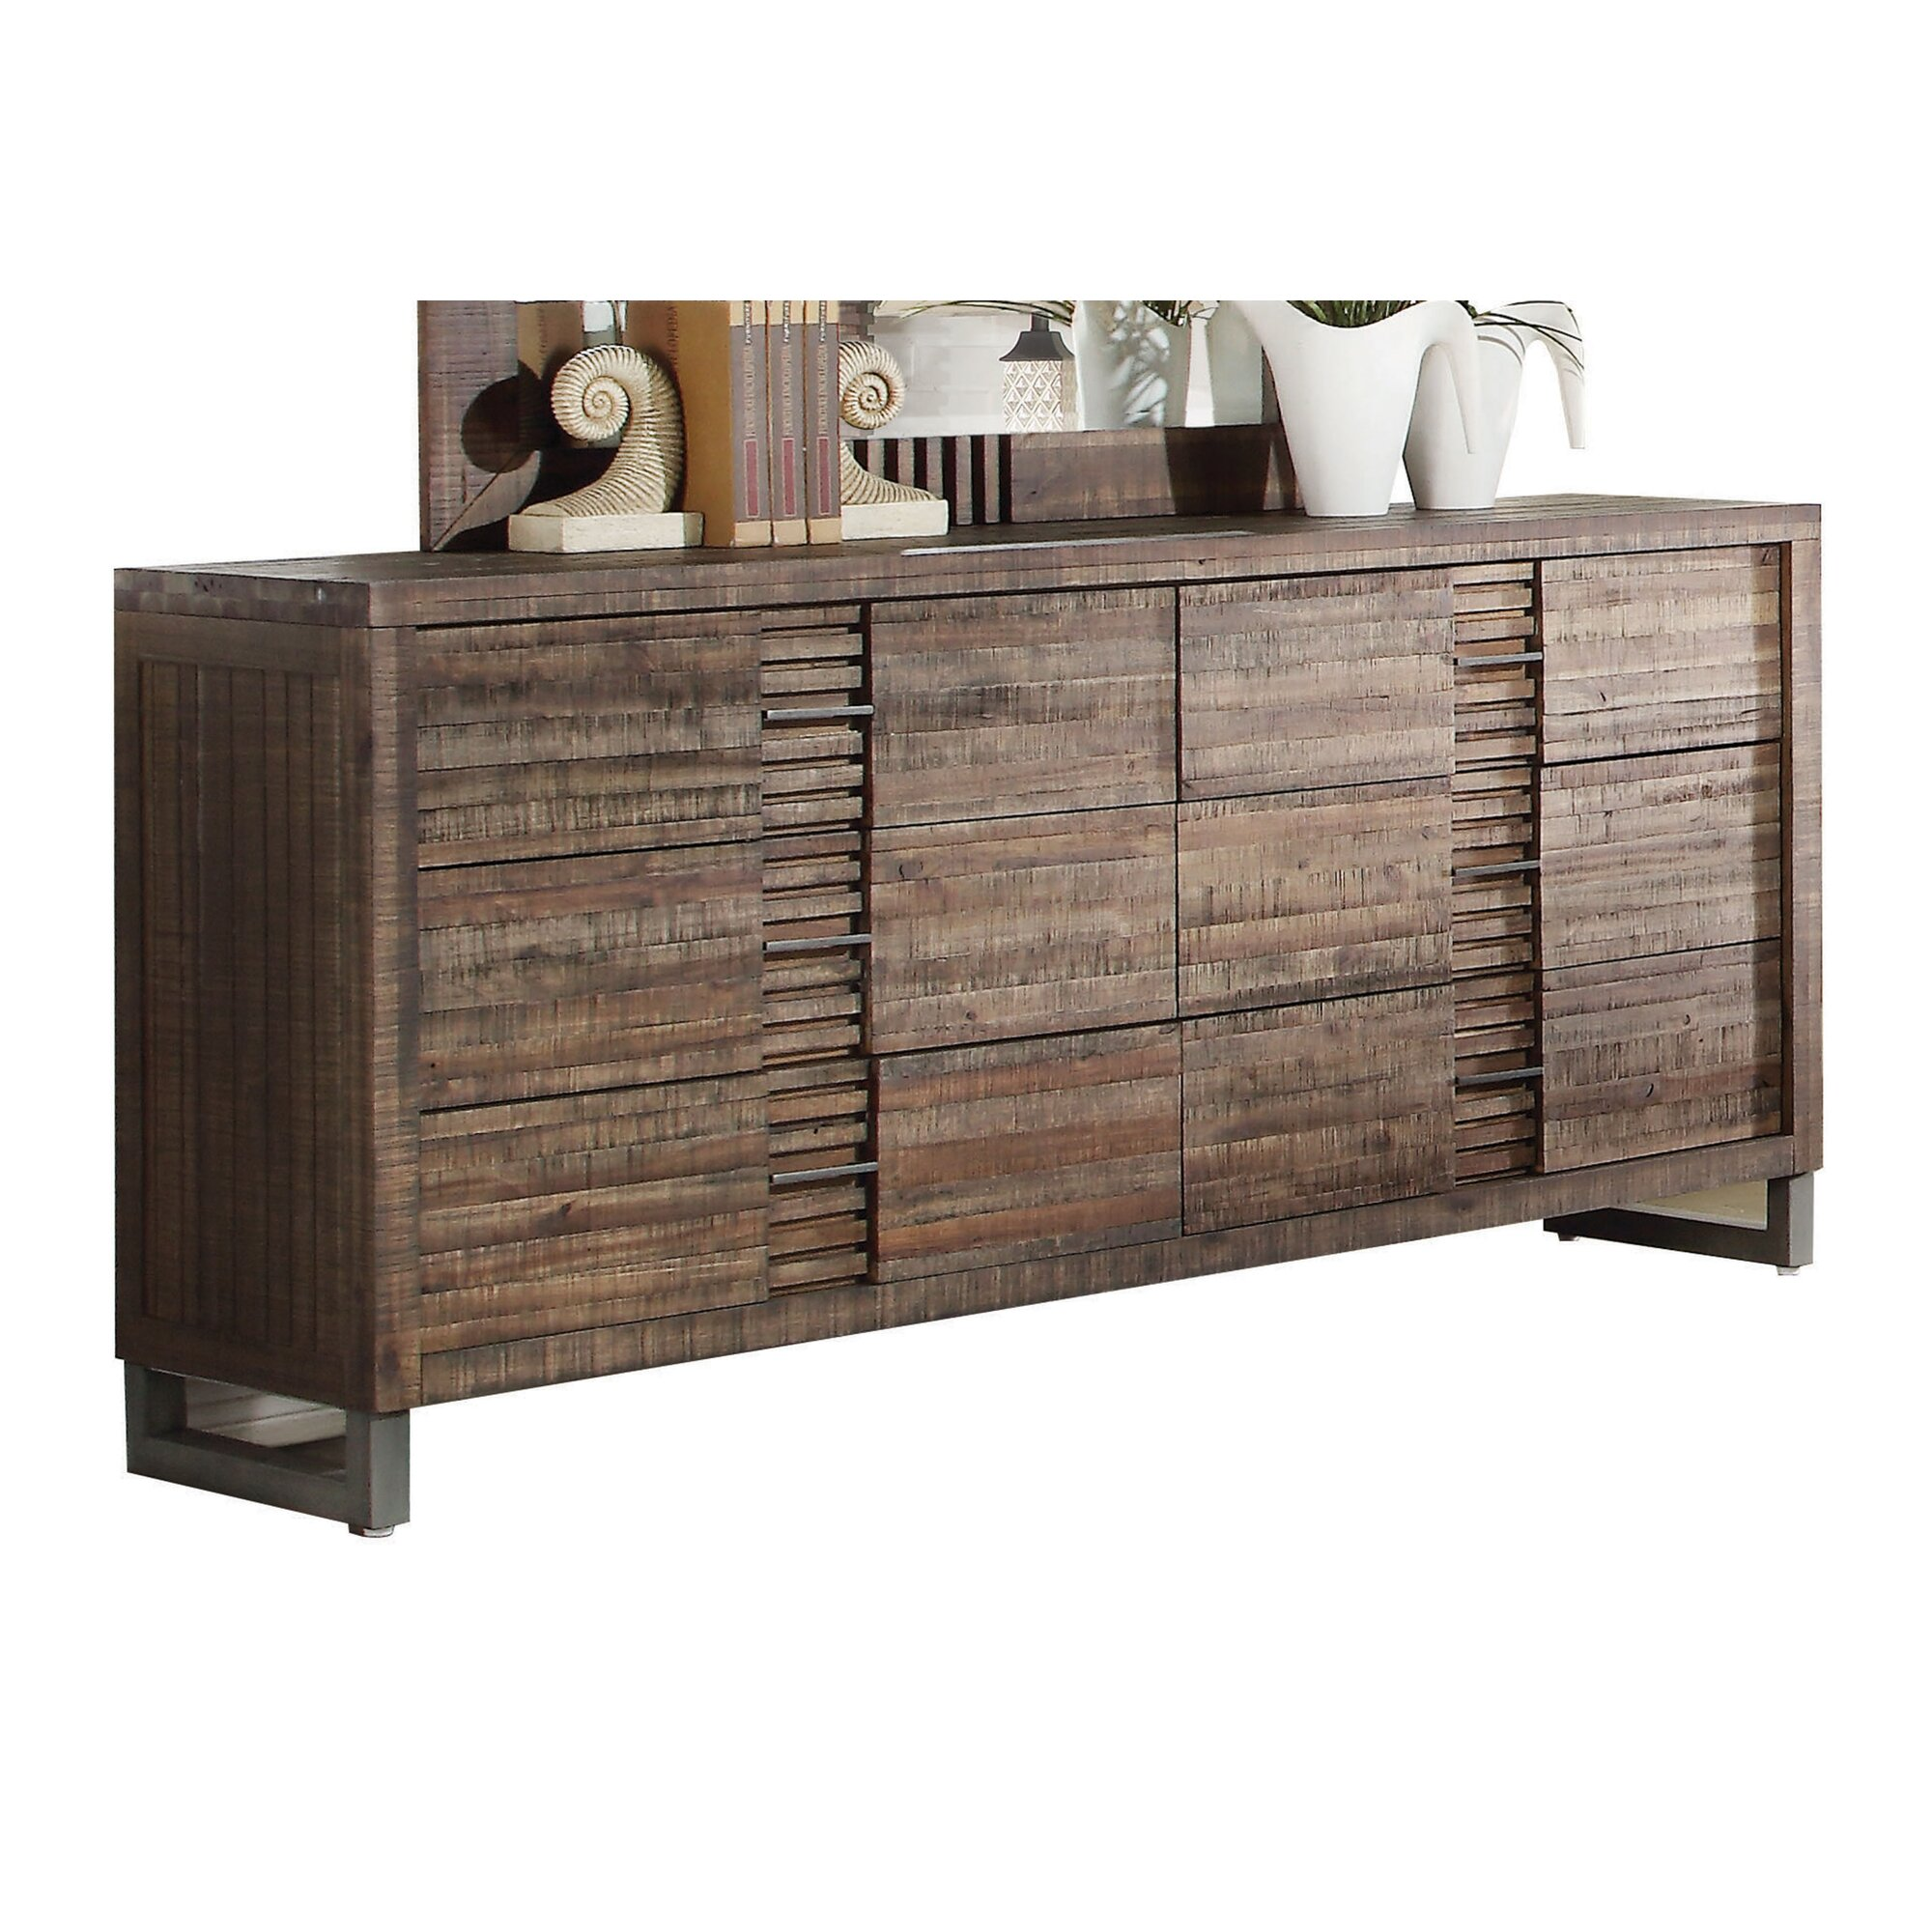 Dresser Dimensions Standard